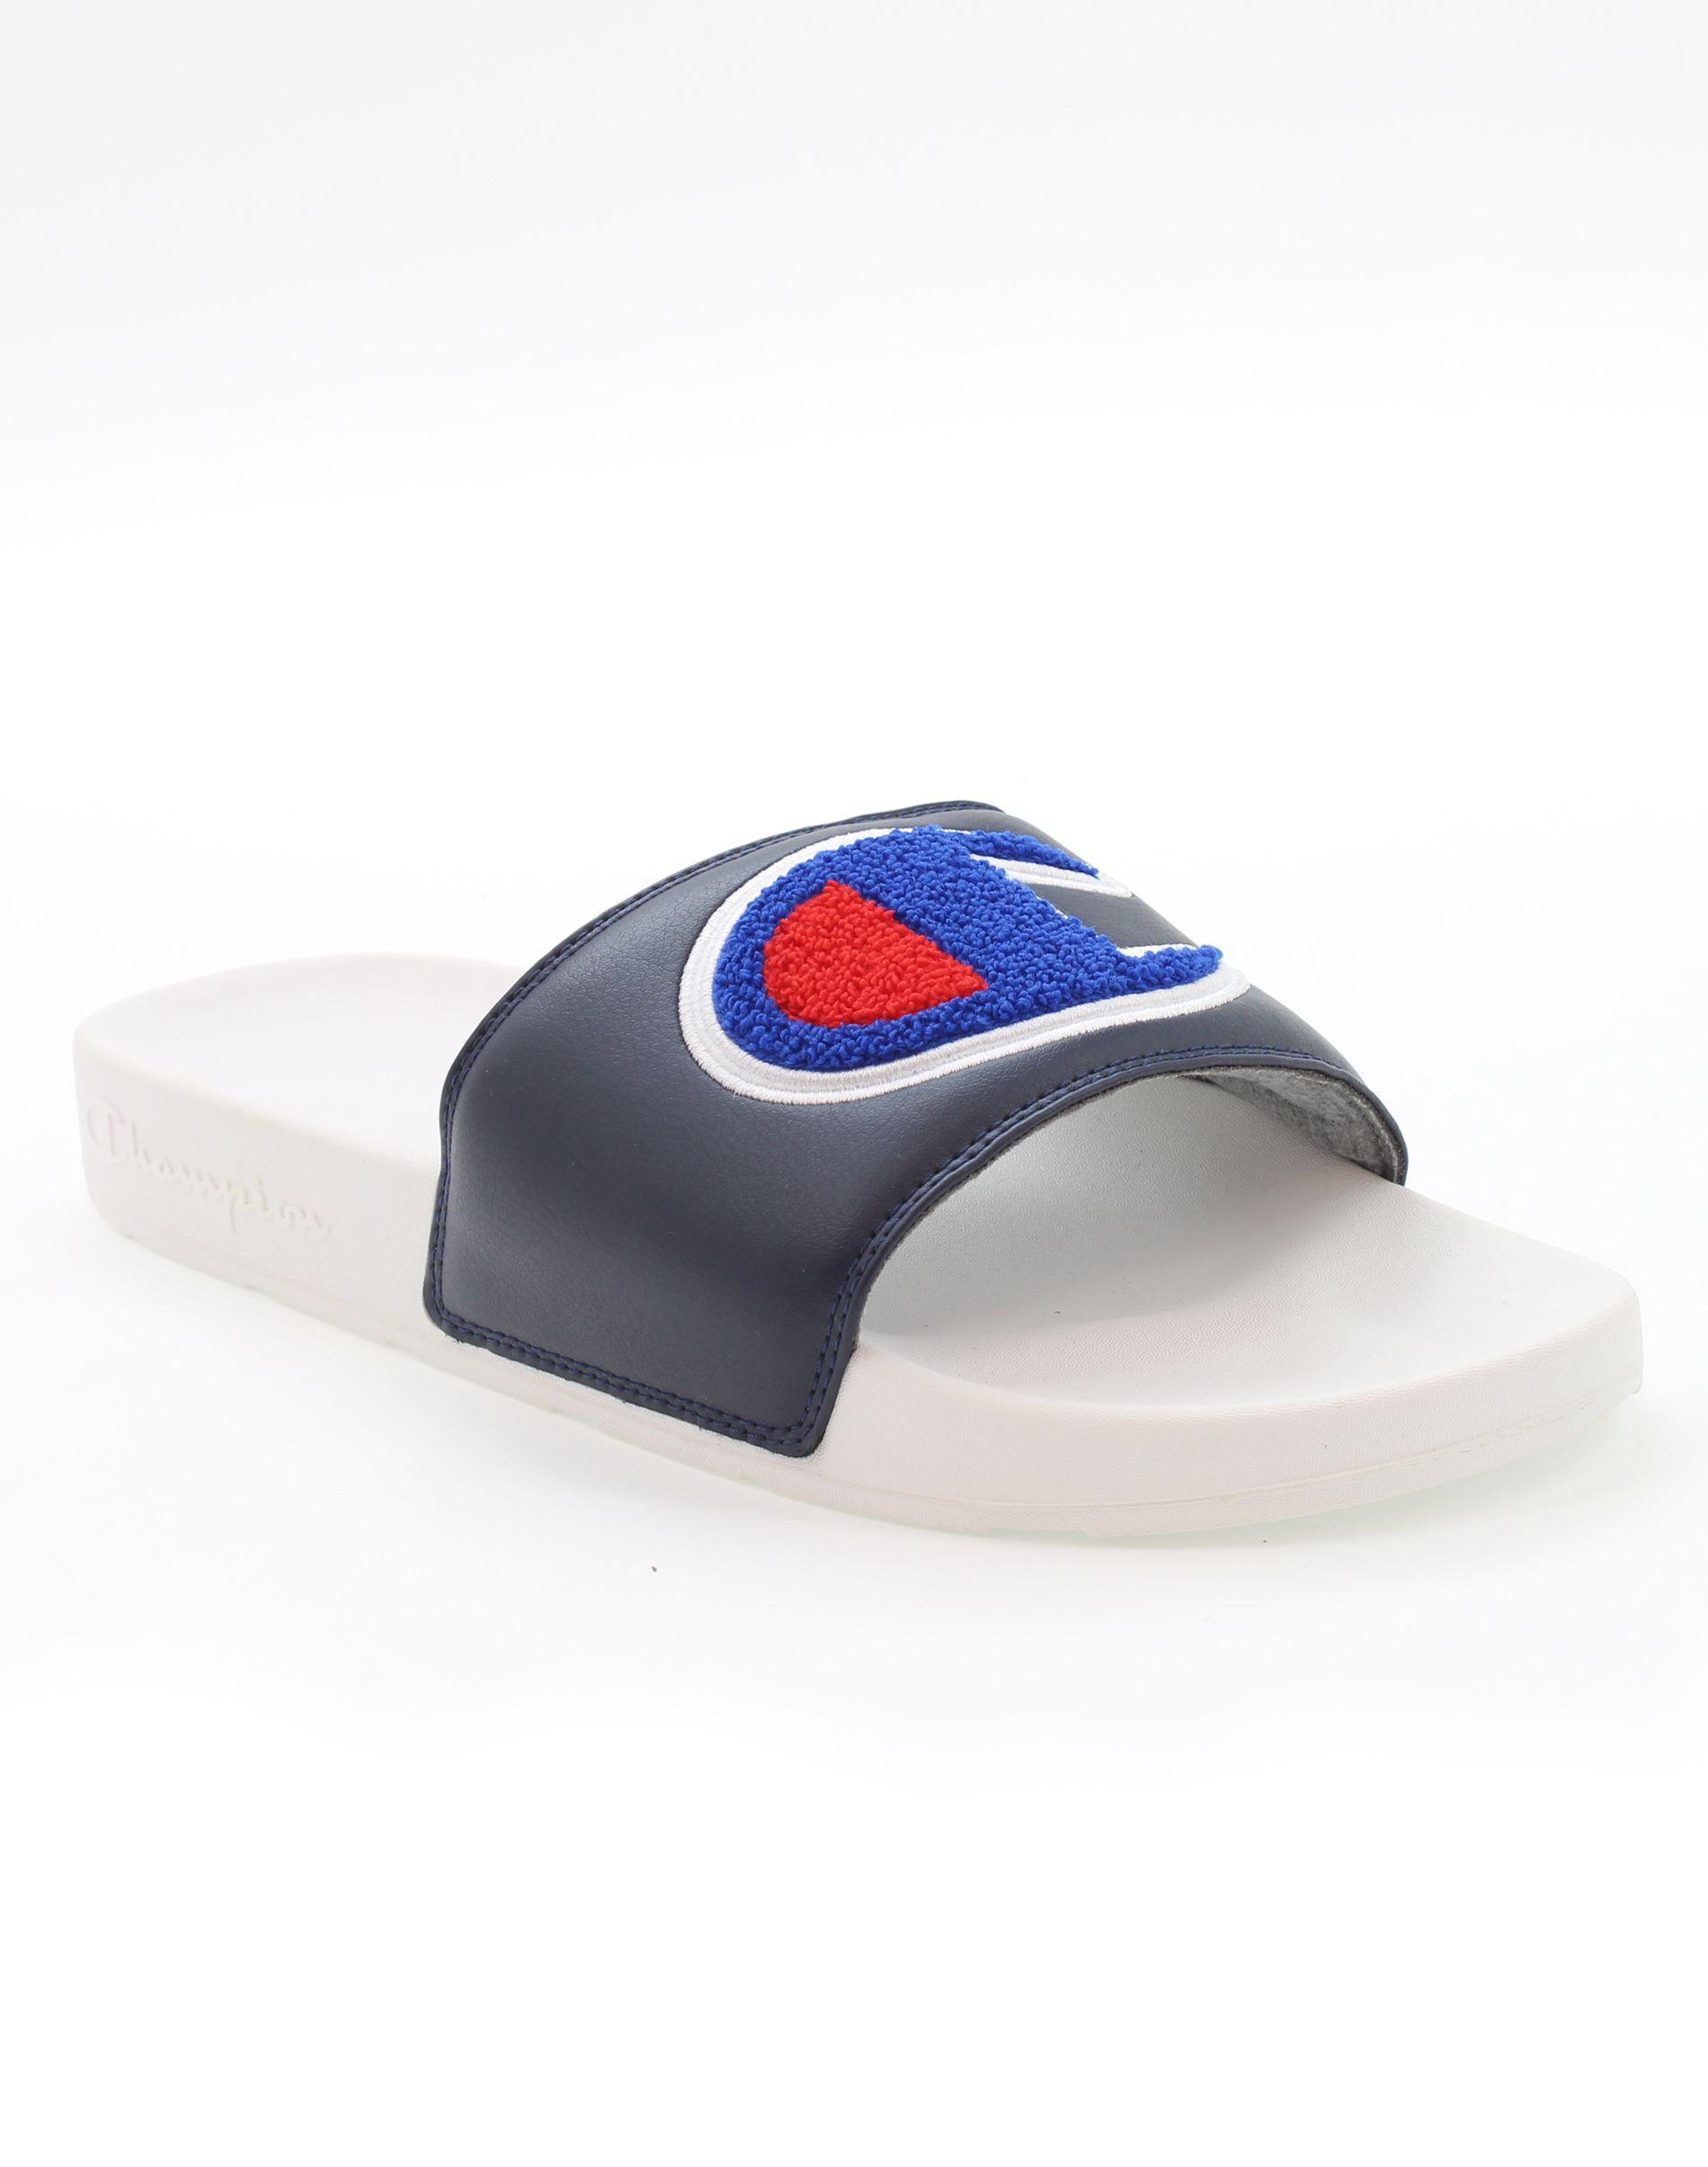 fef04480a09e Lyst - Champion Life® Navy white Slide Sandals